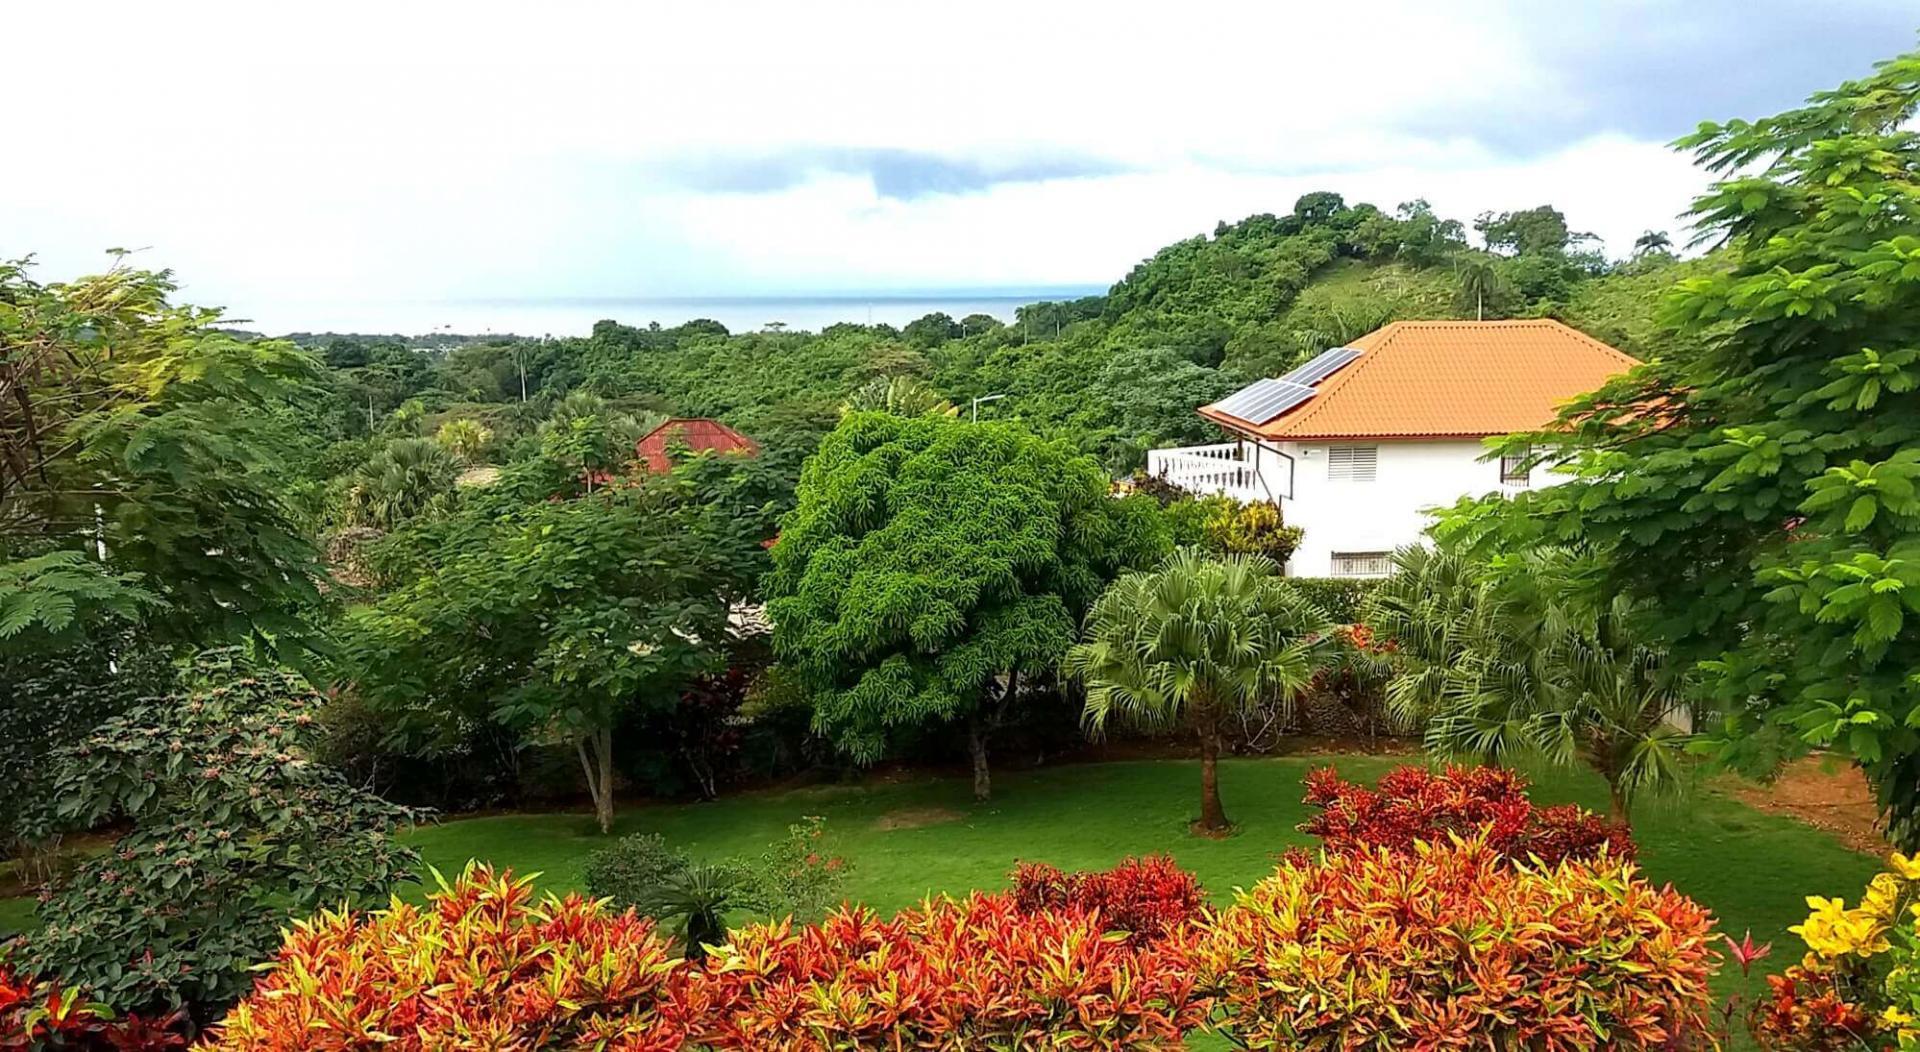 Villa rio san juan 1